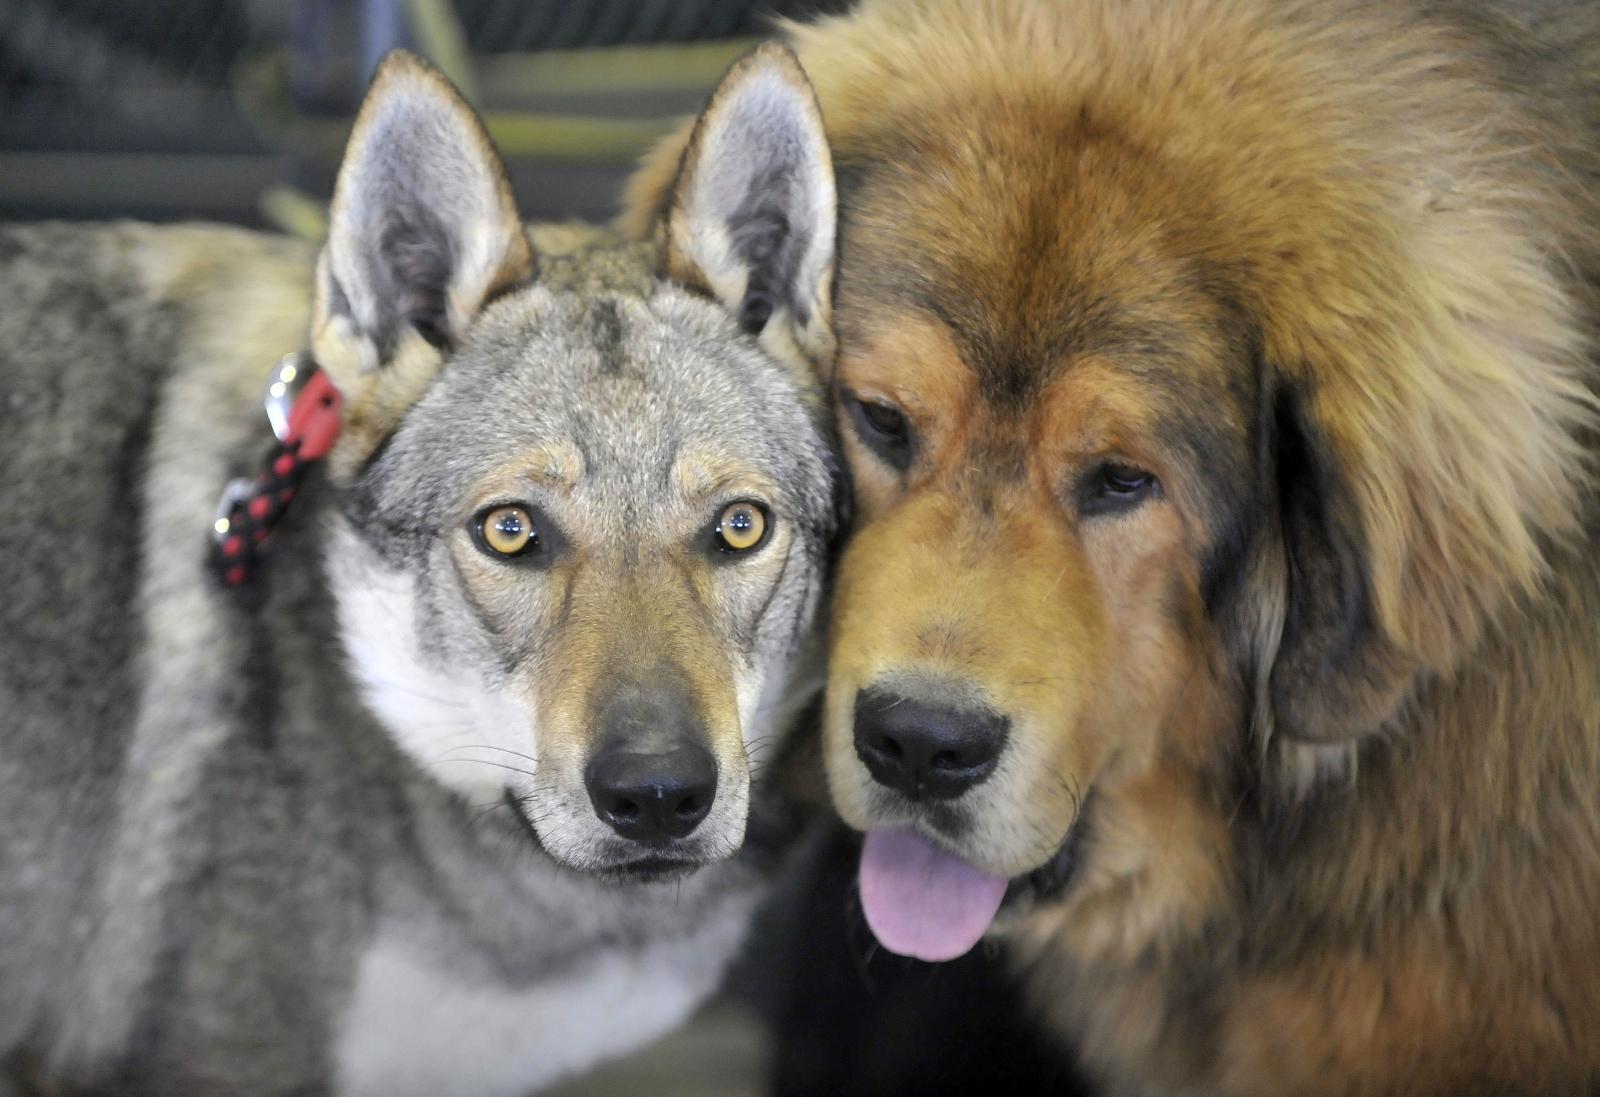 Czechoslovakian Wolfdog and a Tibetan Mastiff